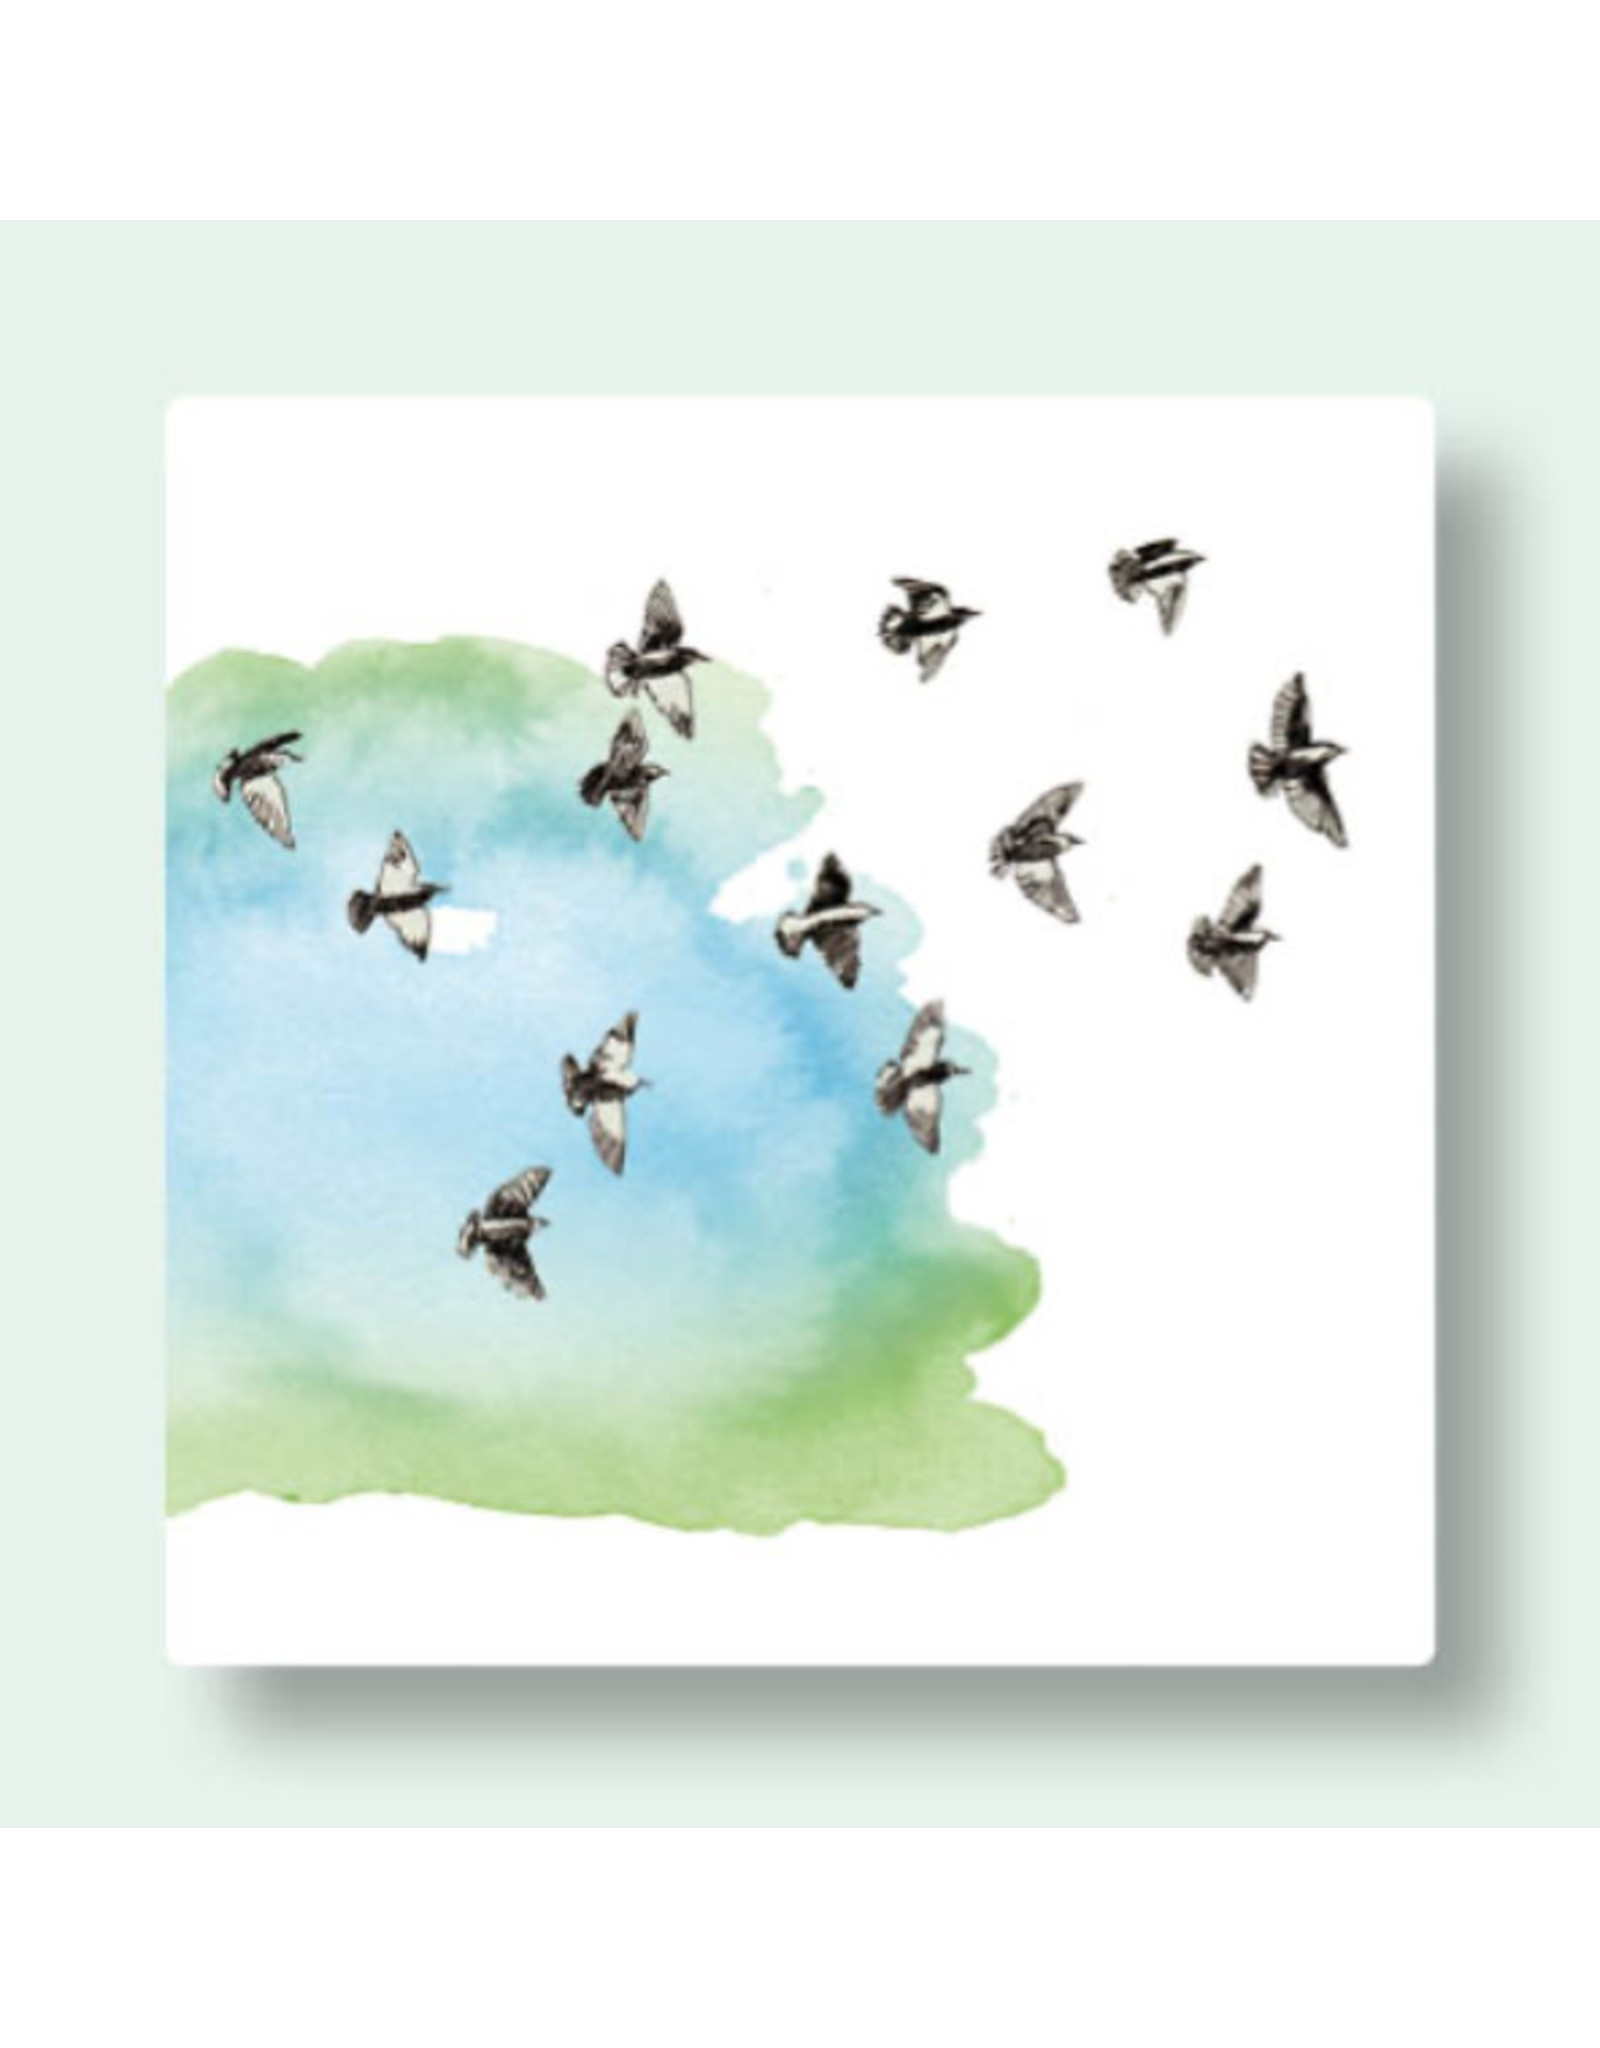 Zintenz Wenskaart - Trekvogels - Postkaart + envelop - Blanco - 13,5x13,5